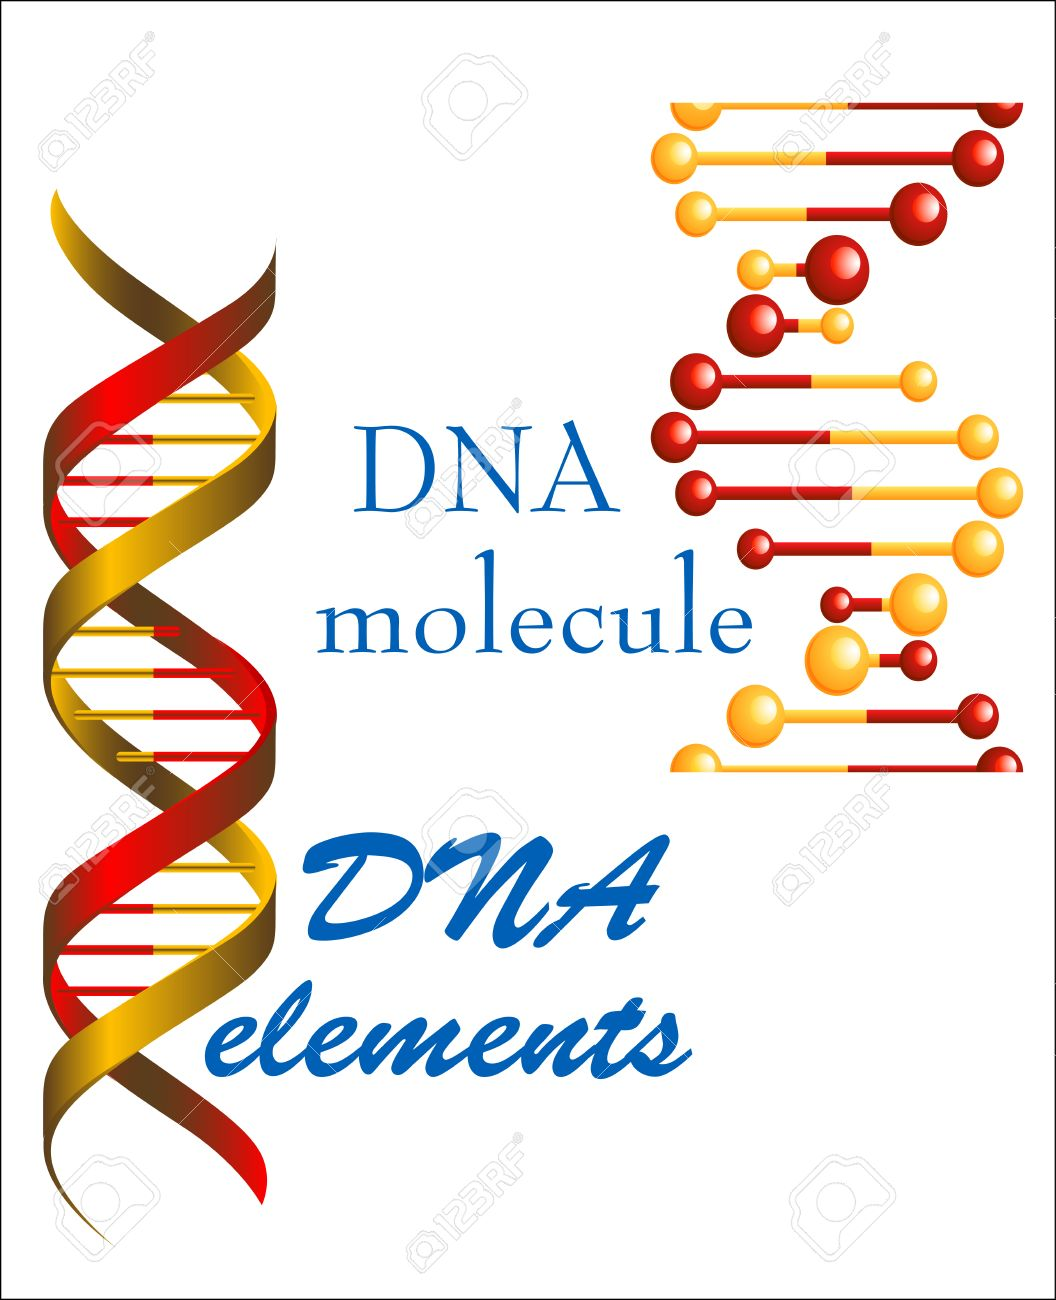 Dna Molecule And Elements Symbols For Medicine Genetics And